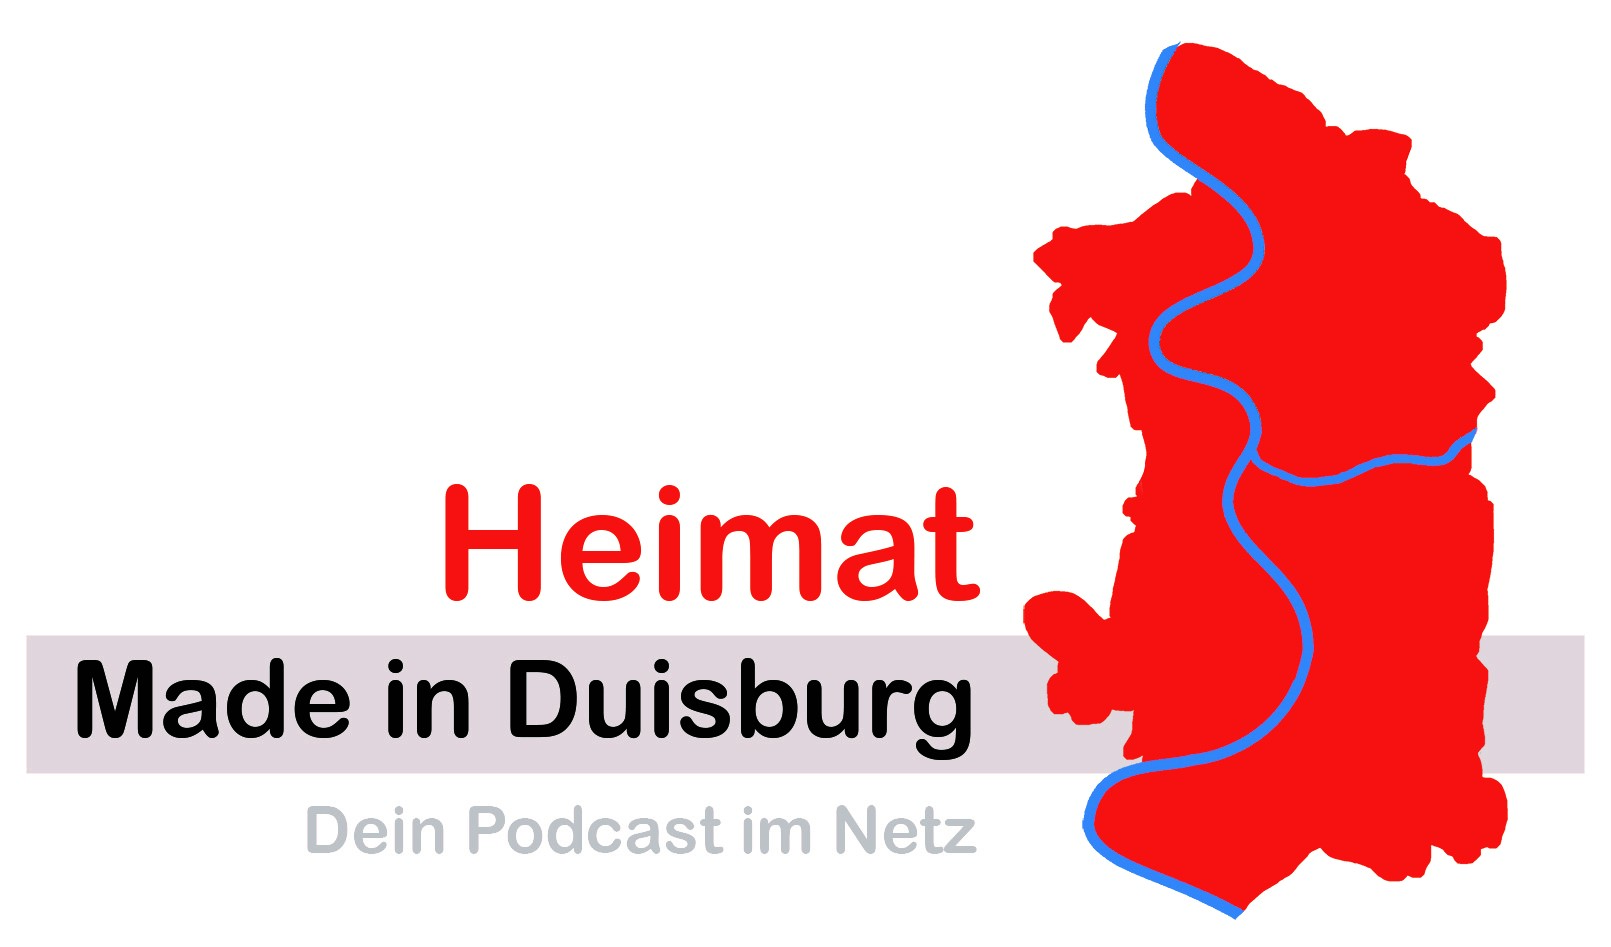 madeinduisburg